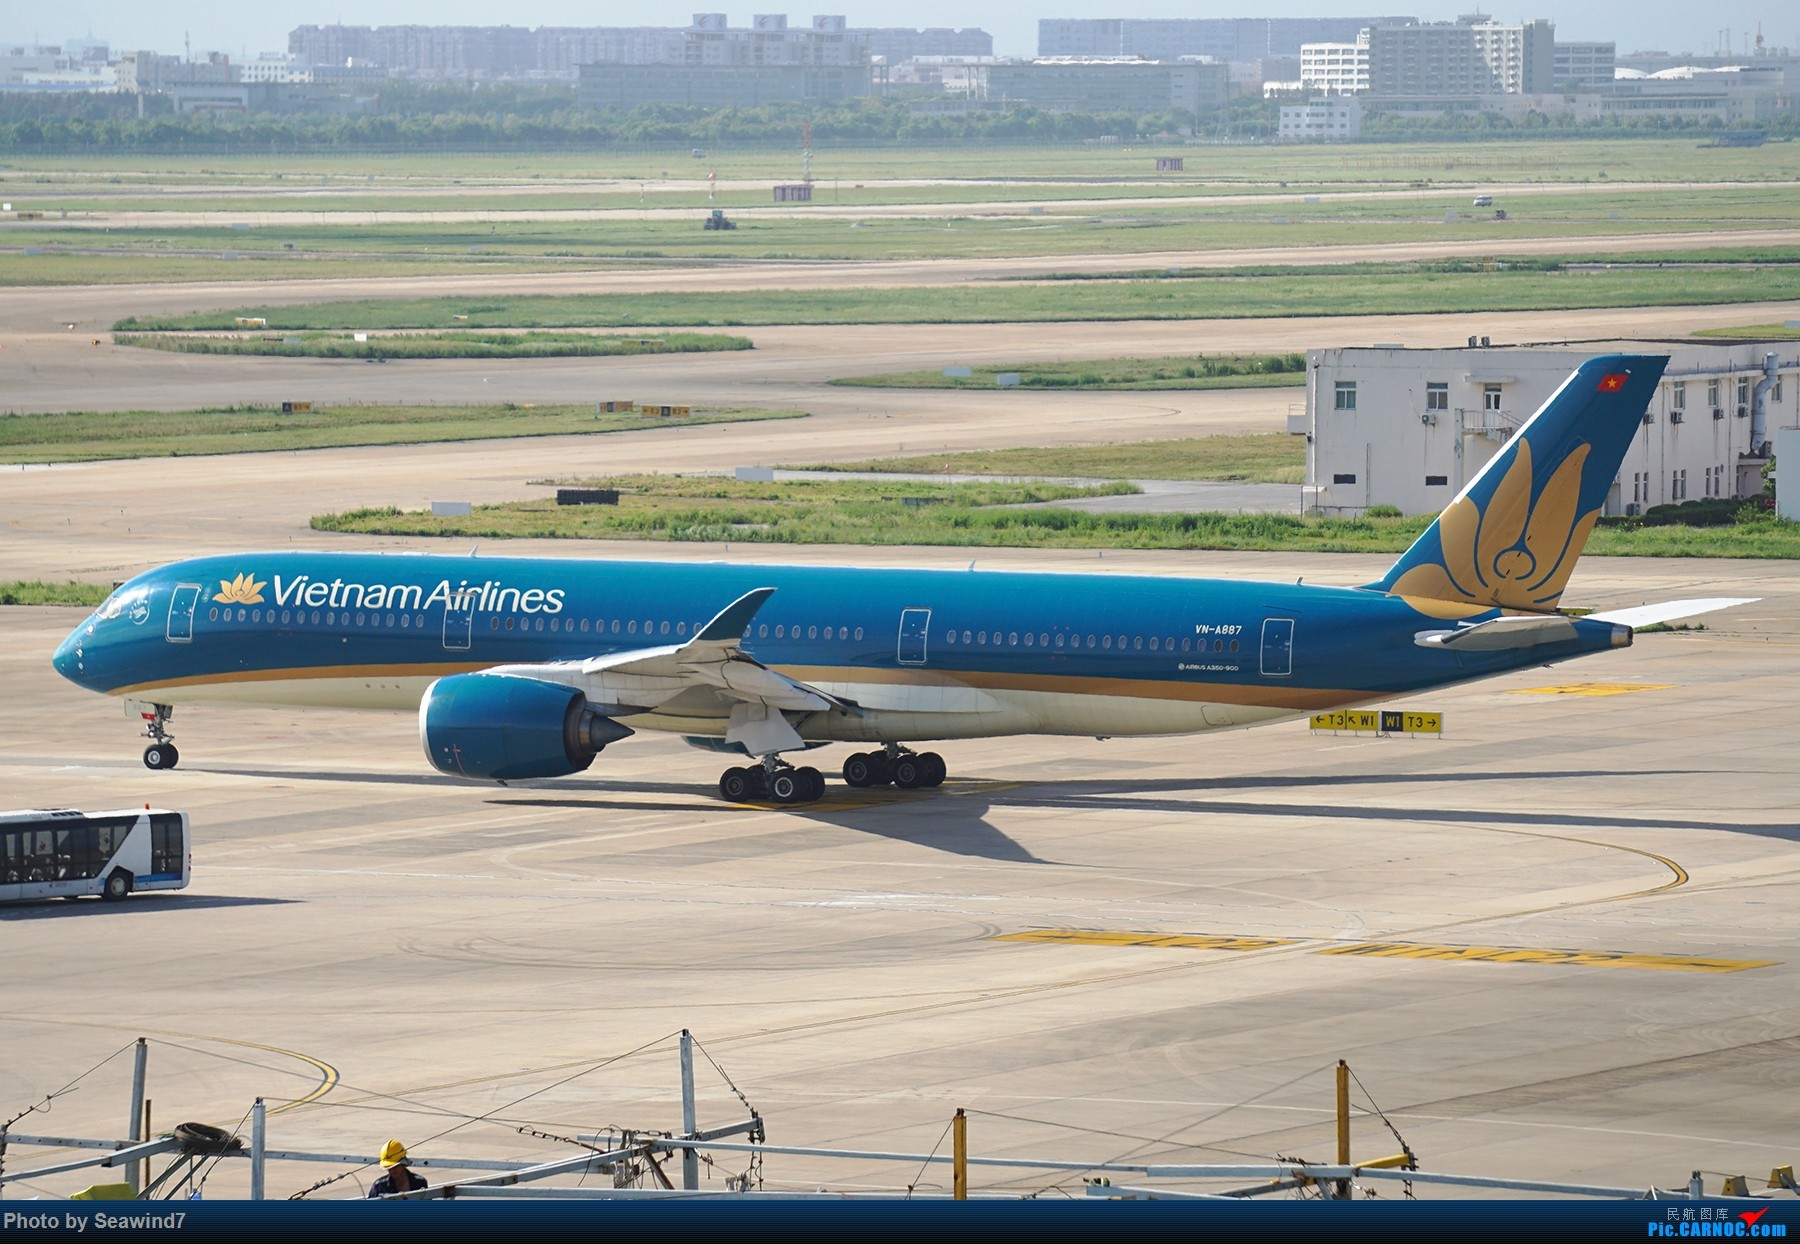 Re:[原创]浦东拍机记 AIRBUS A350-900 VN-A887 中国上海浦东国际机场